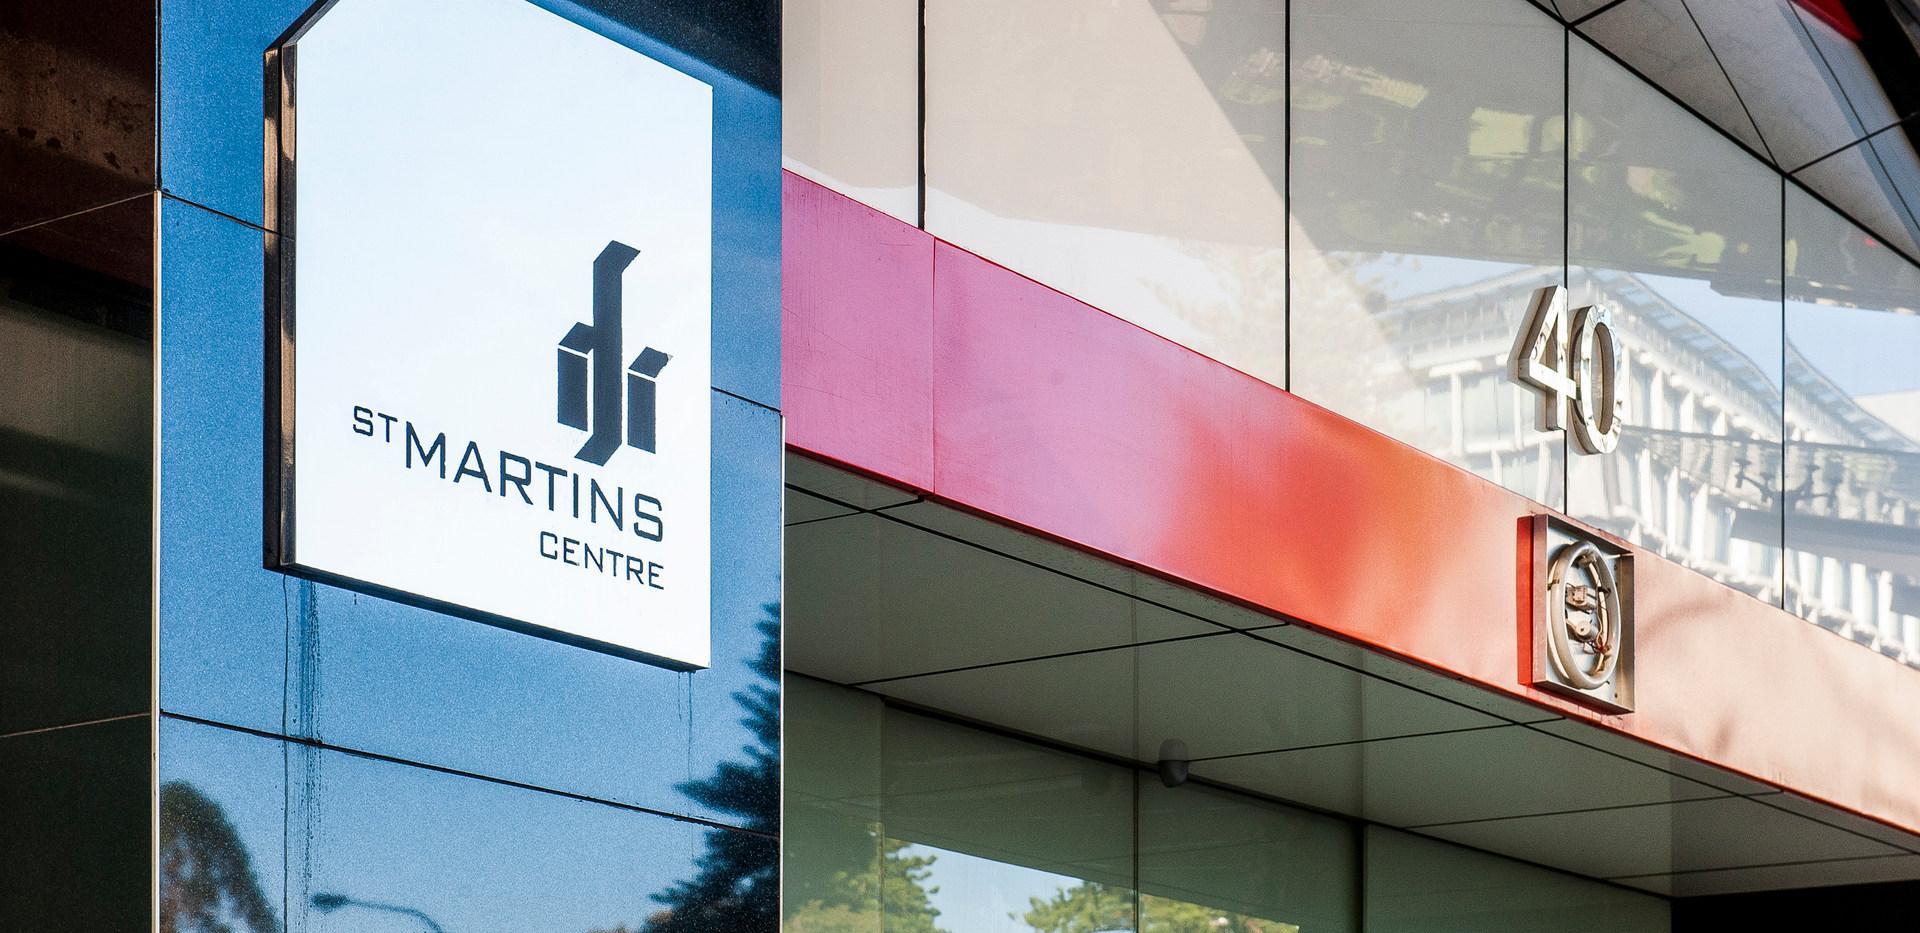 st-martins-centre-191.jpg